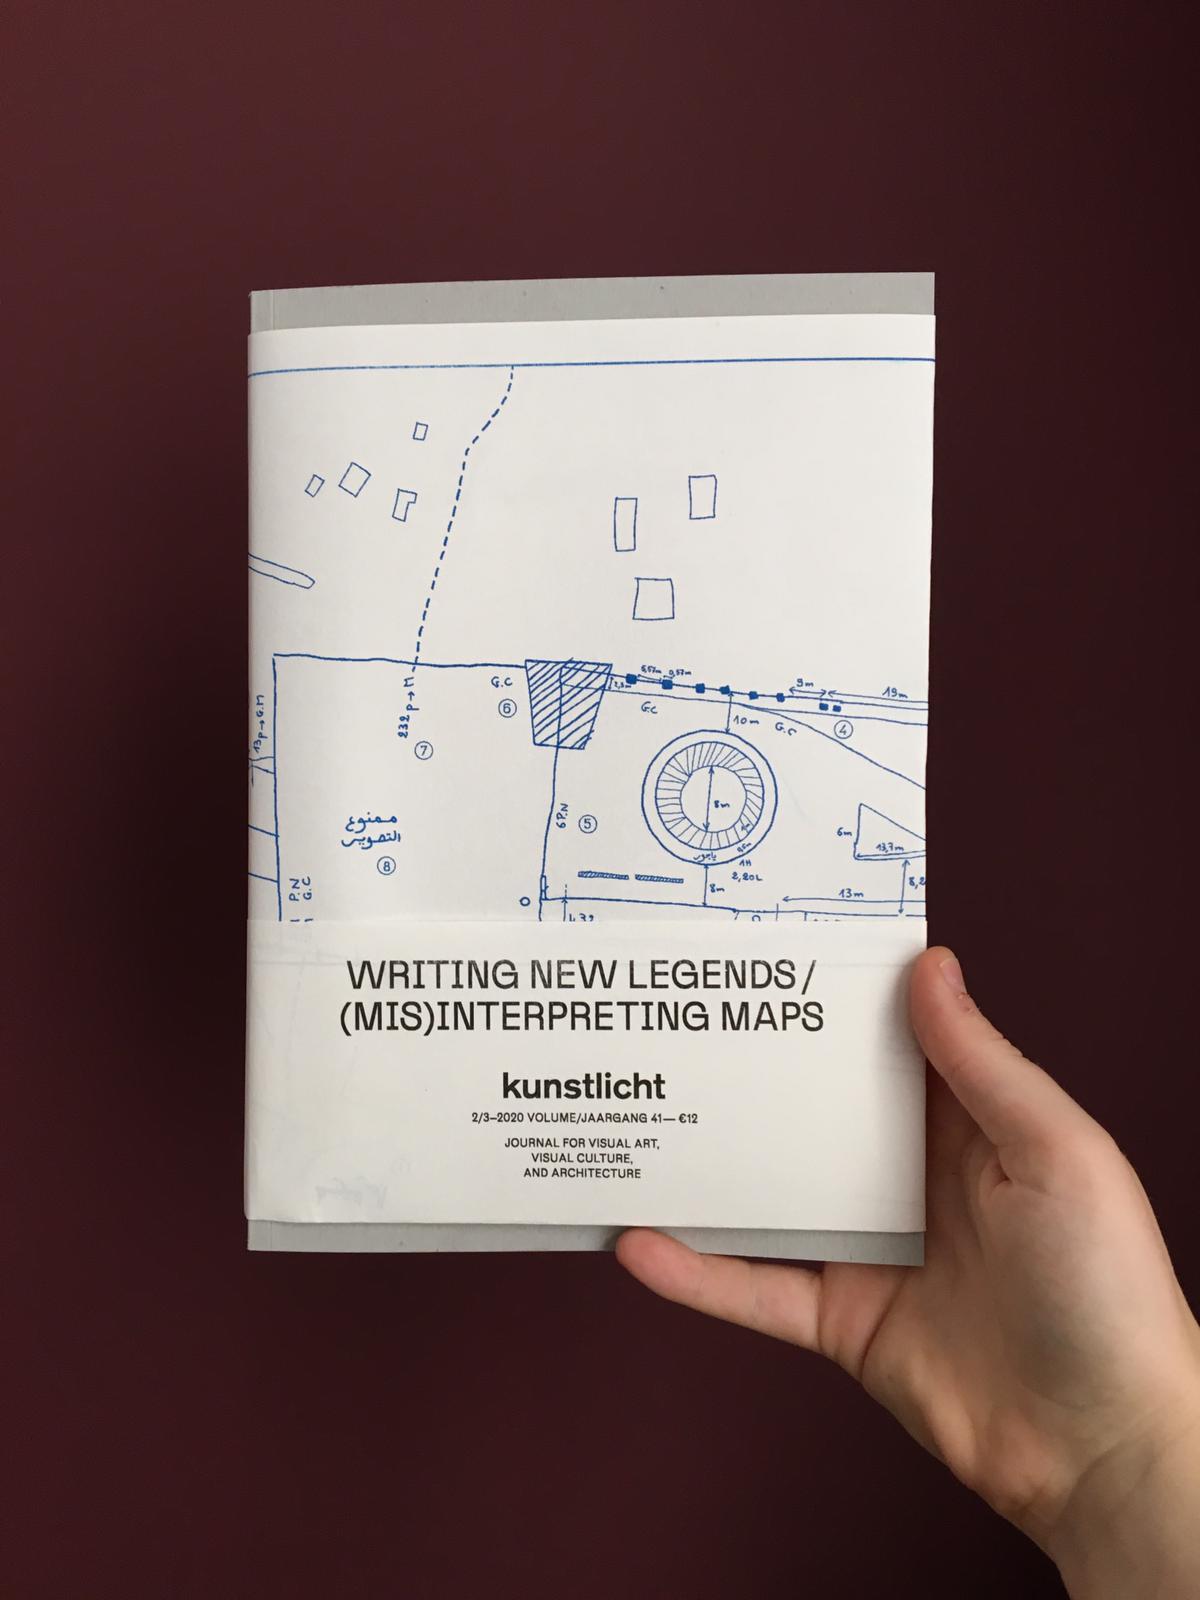 VOL. 41 NO 2-3, 2020, WRITING NEW LEGENDS / (MIS)INTERPRETING MAPS